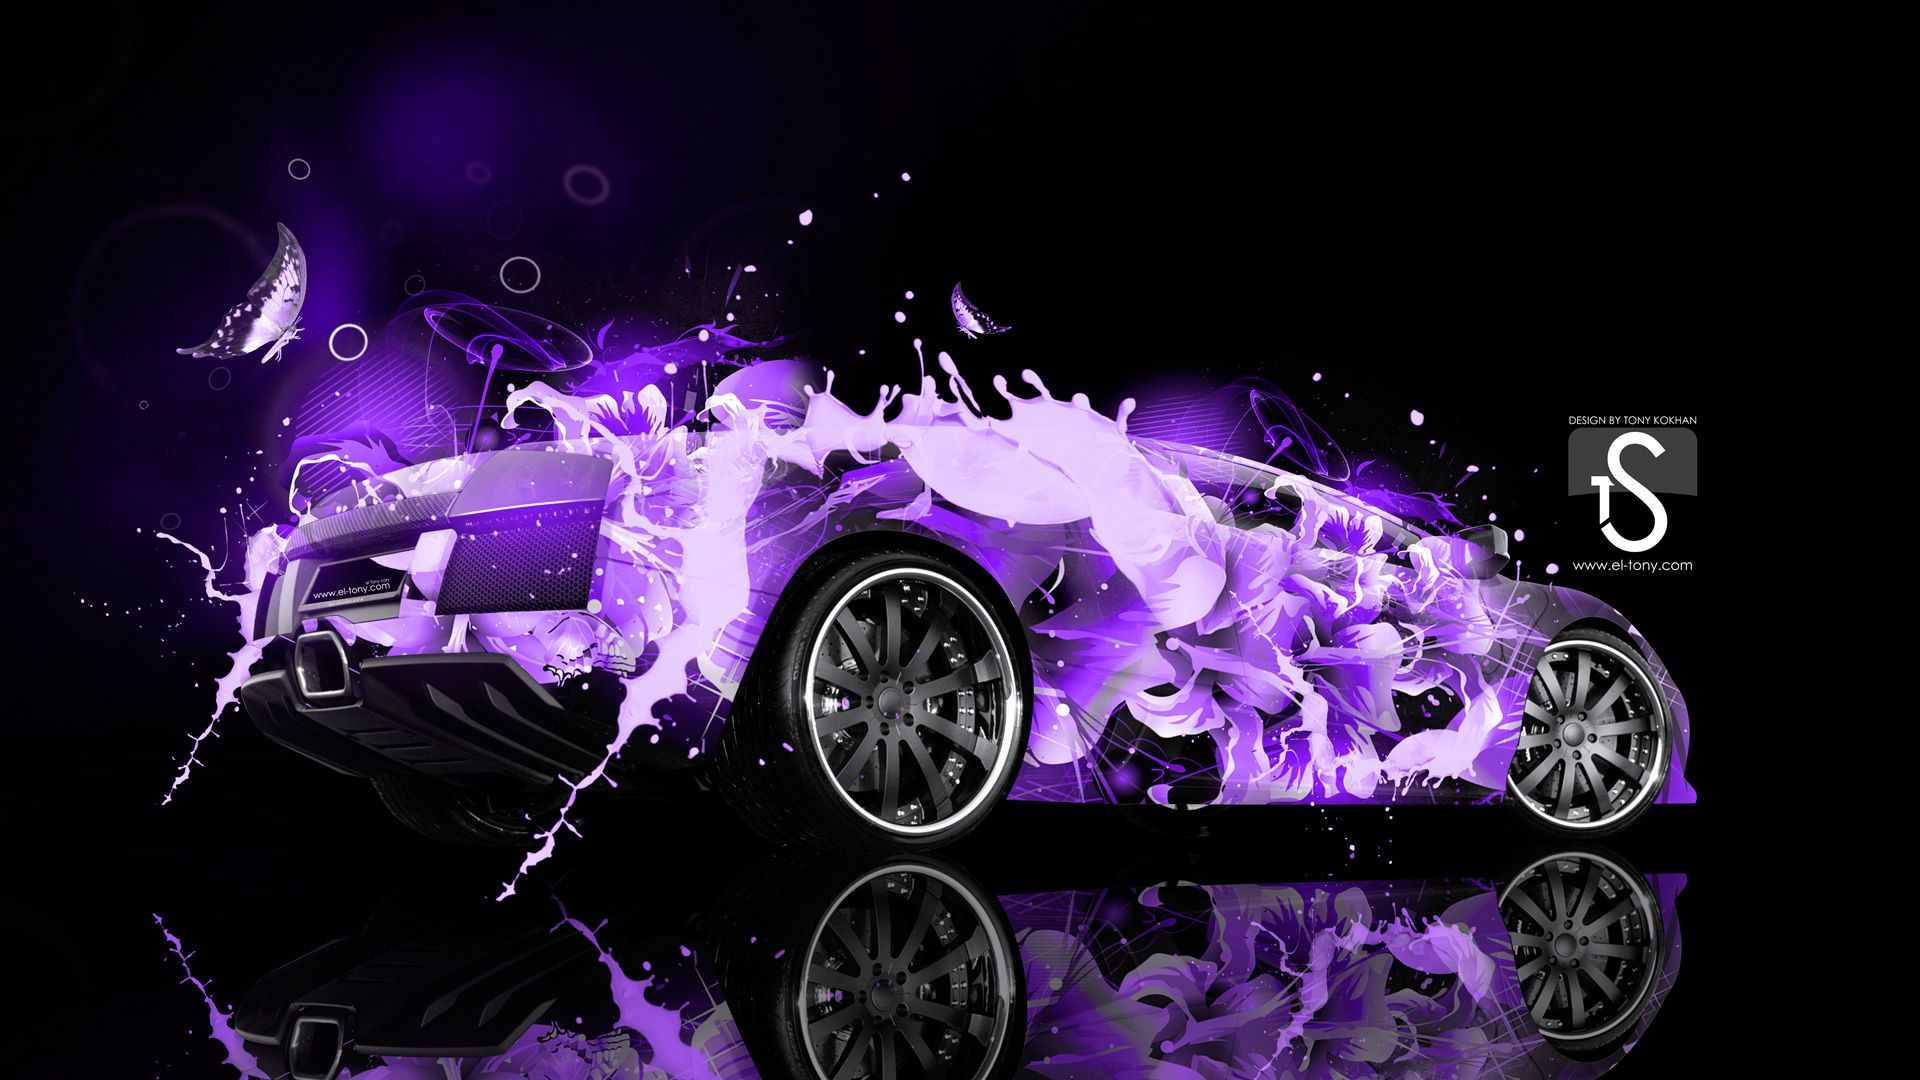 Lamborghini Egoista Google Search Jordans Yachts Wachtes Lambo